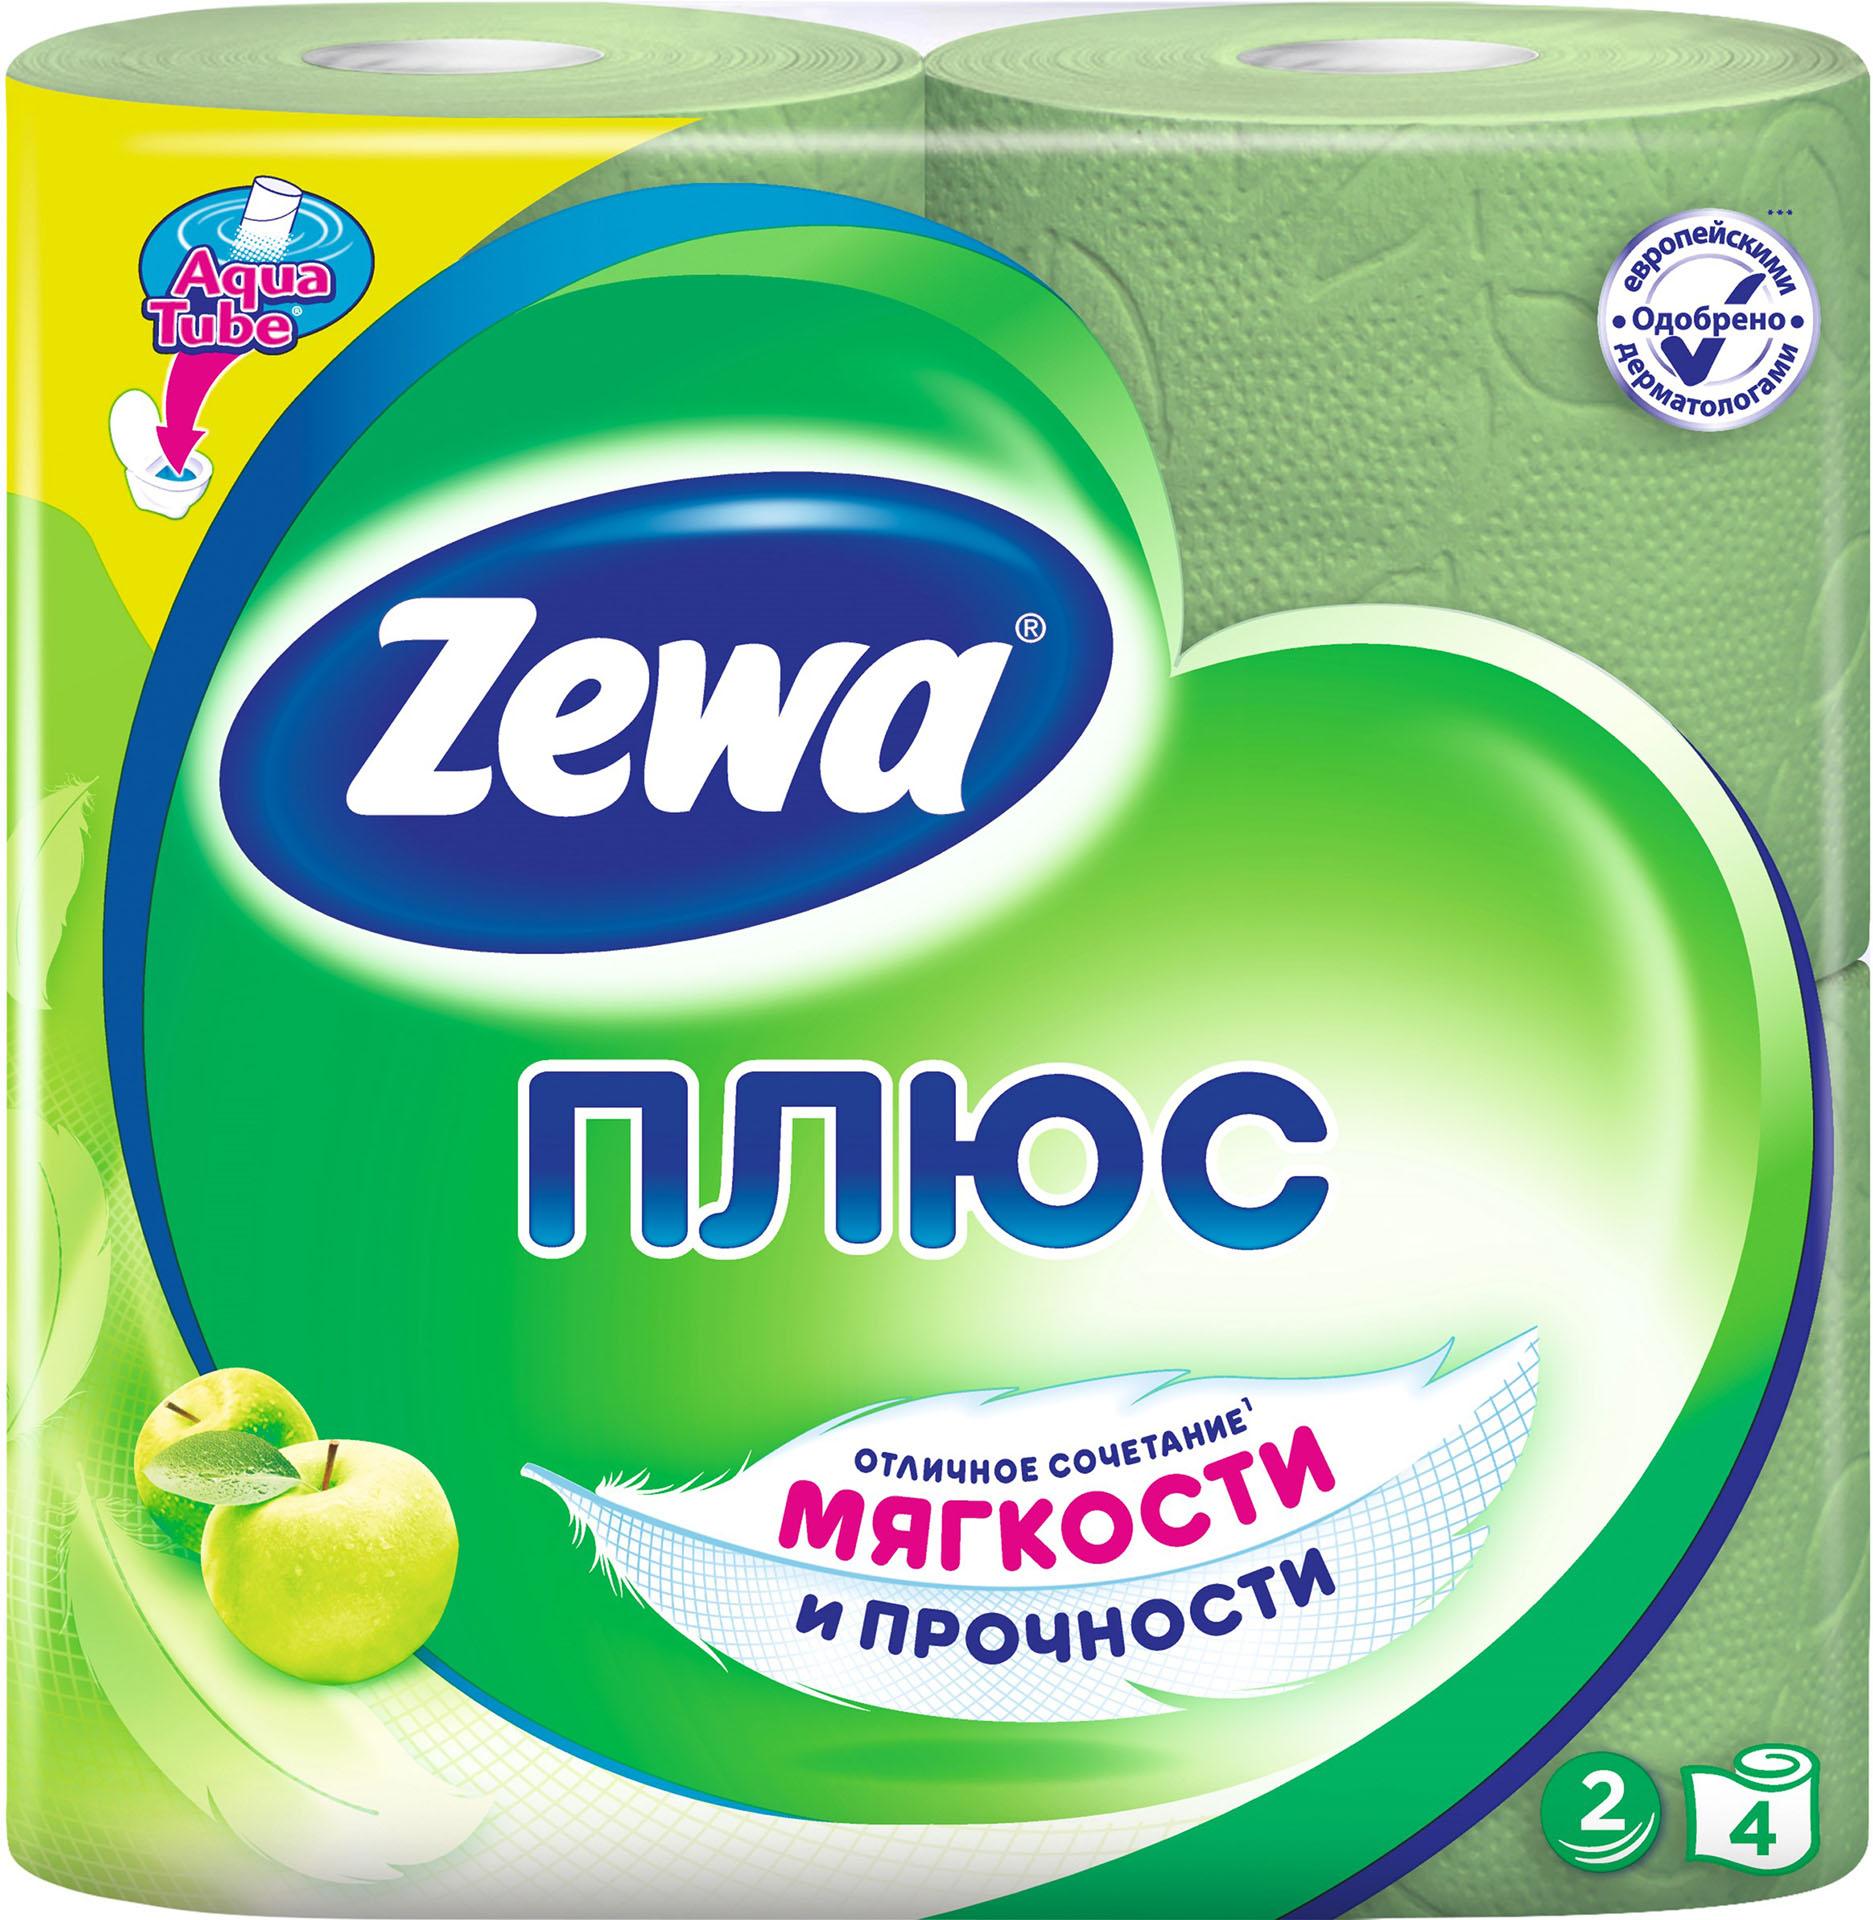 Туалетная бумага Стандарт 2-х сл., целлюлоза, 168отр.(9,5*12,5см.) Яблоко, 4шт./уп., зелен.